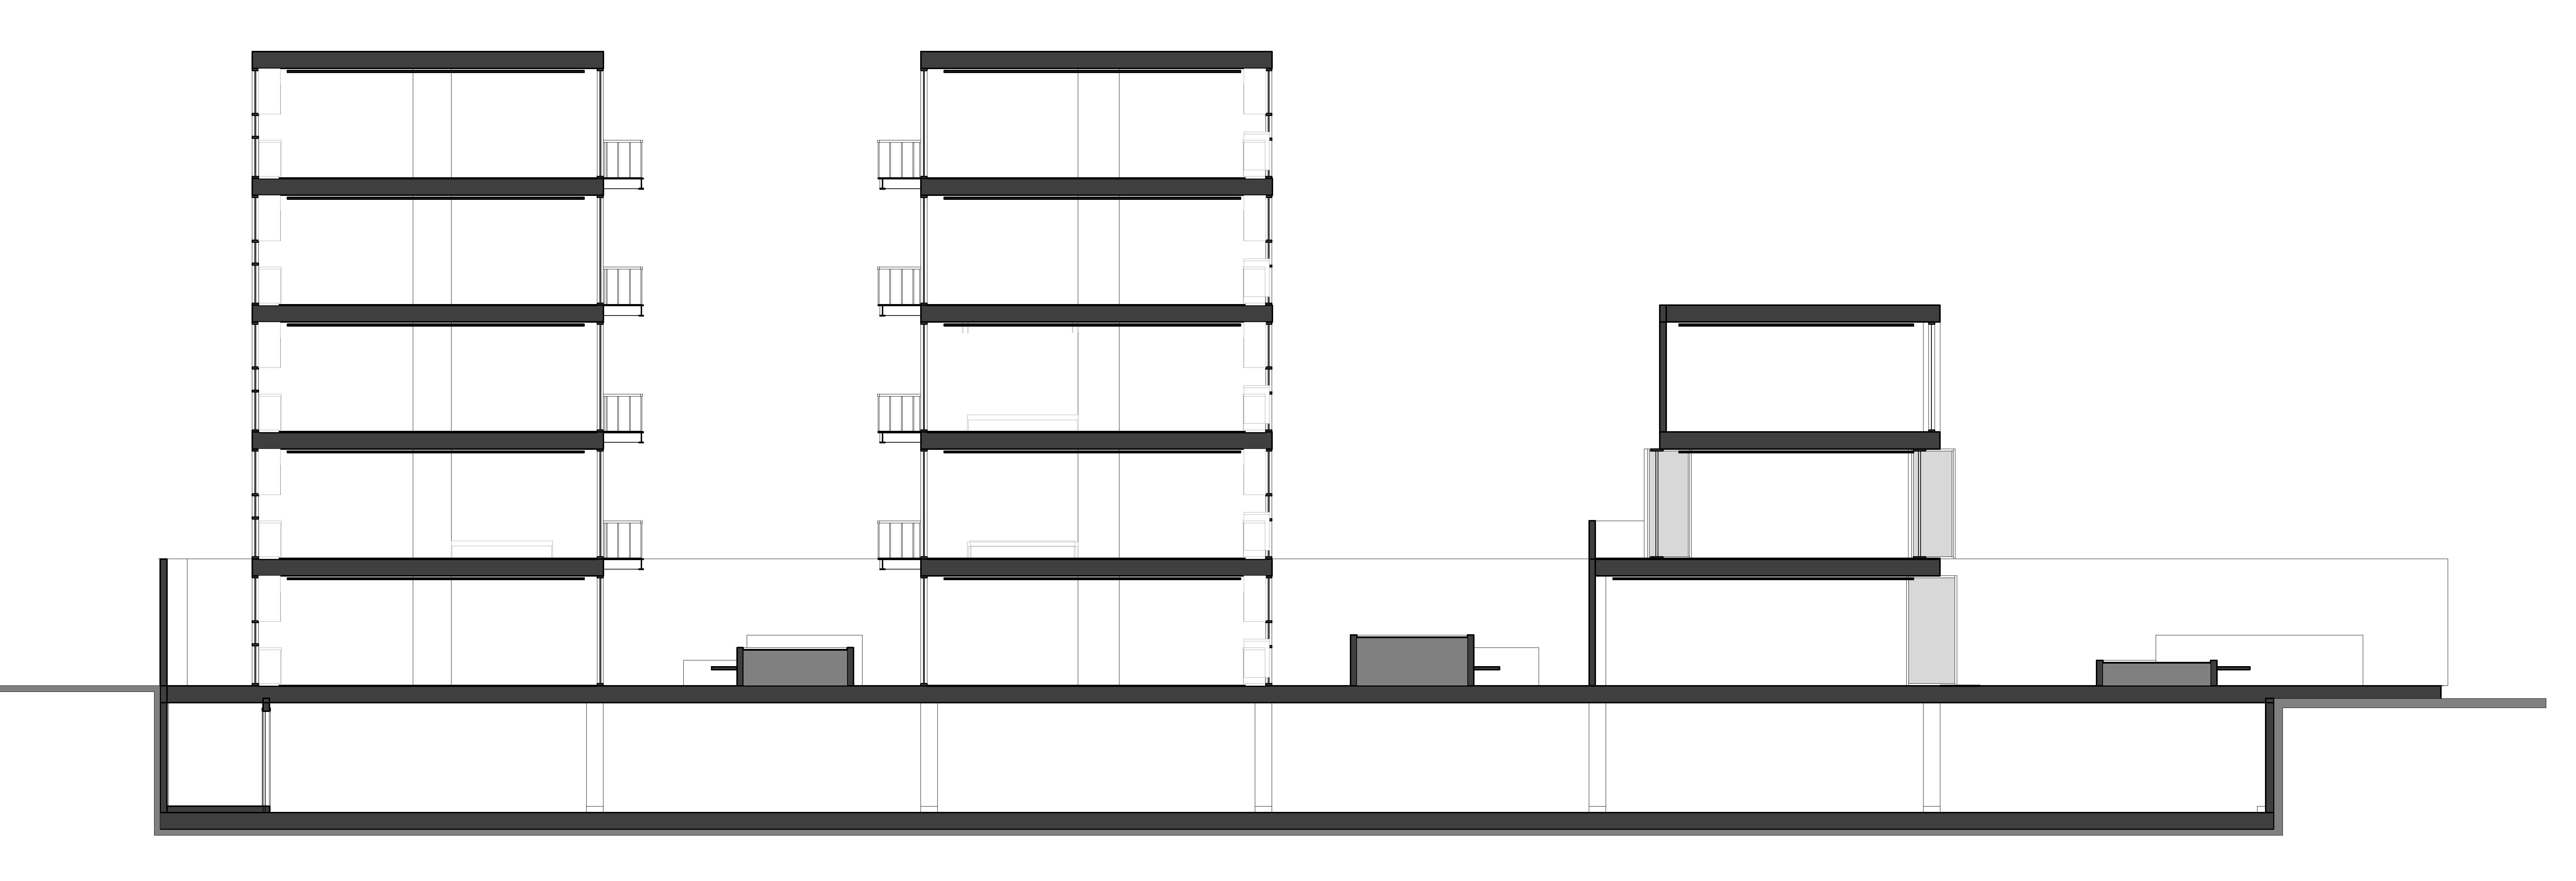 Section - C-C'